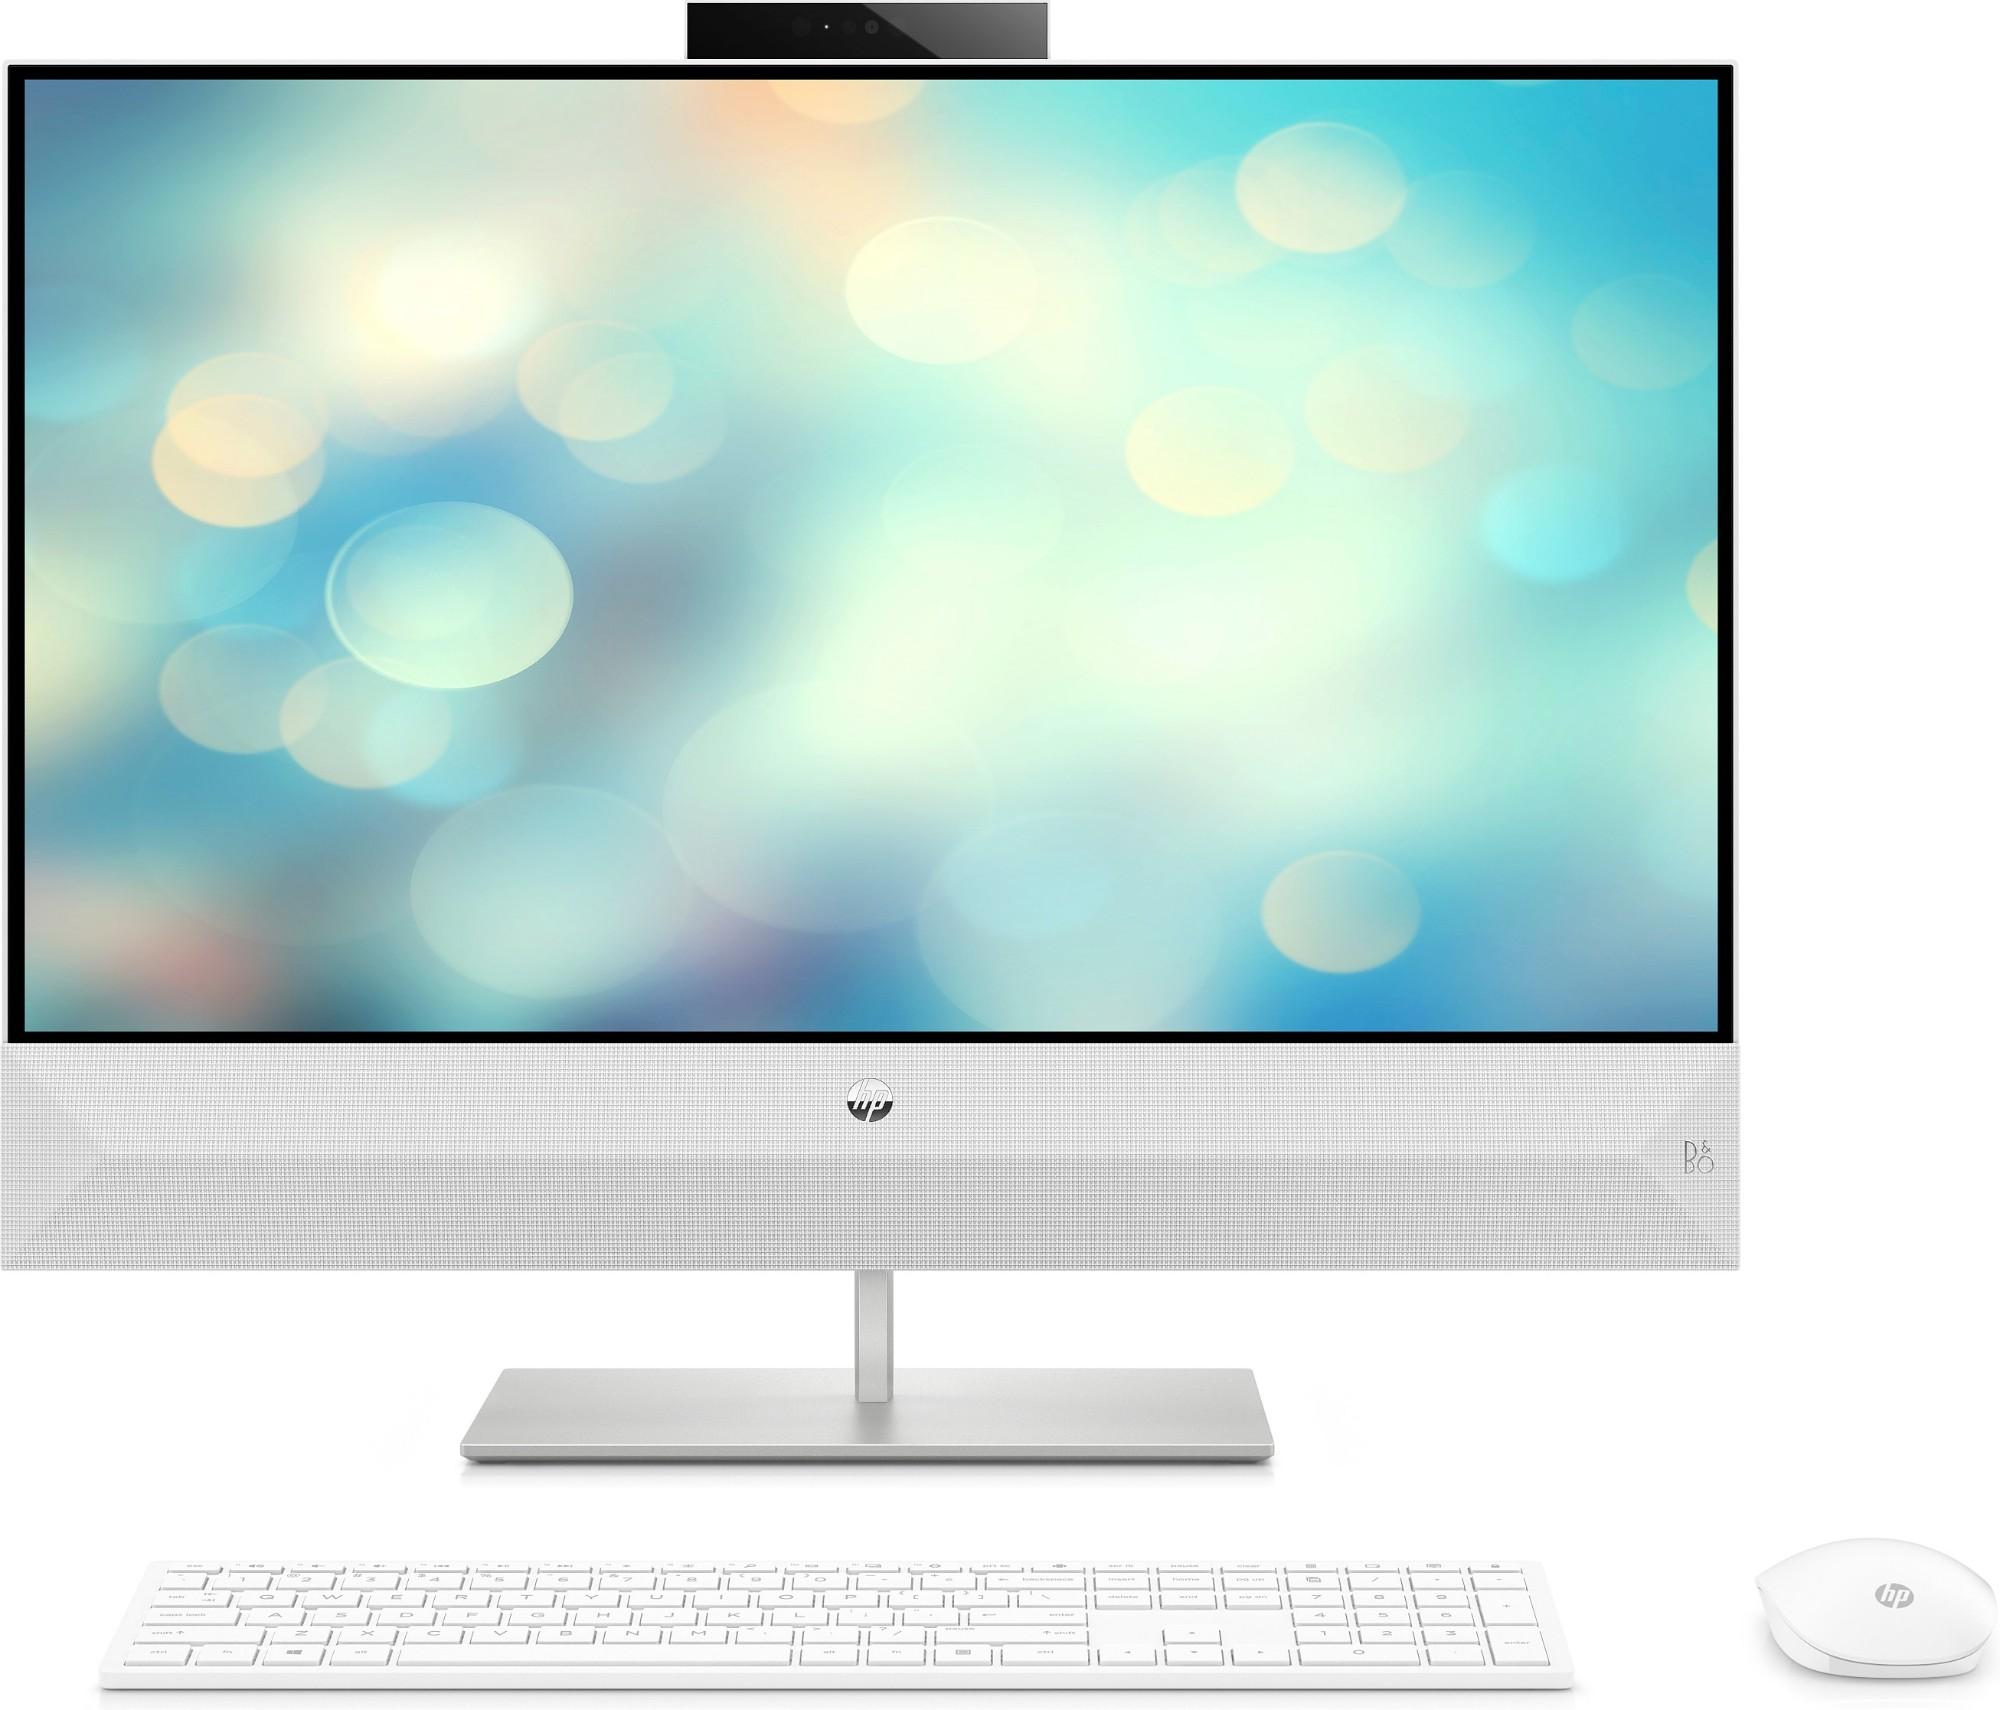 "HP Pavilion 27-xa0004na 68.6 cm (27"") 1920 x 1080 pixels 2.40 GHz 8th gen Intel® Core™ i7 i7-8700T White All-in-One PC"